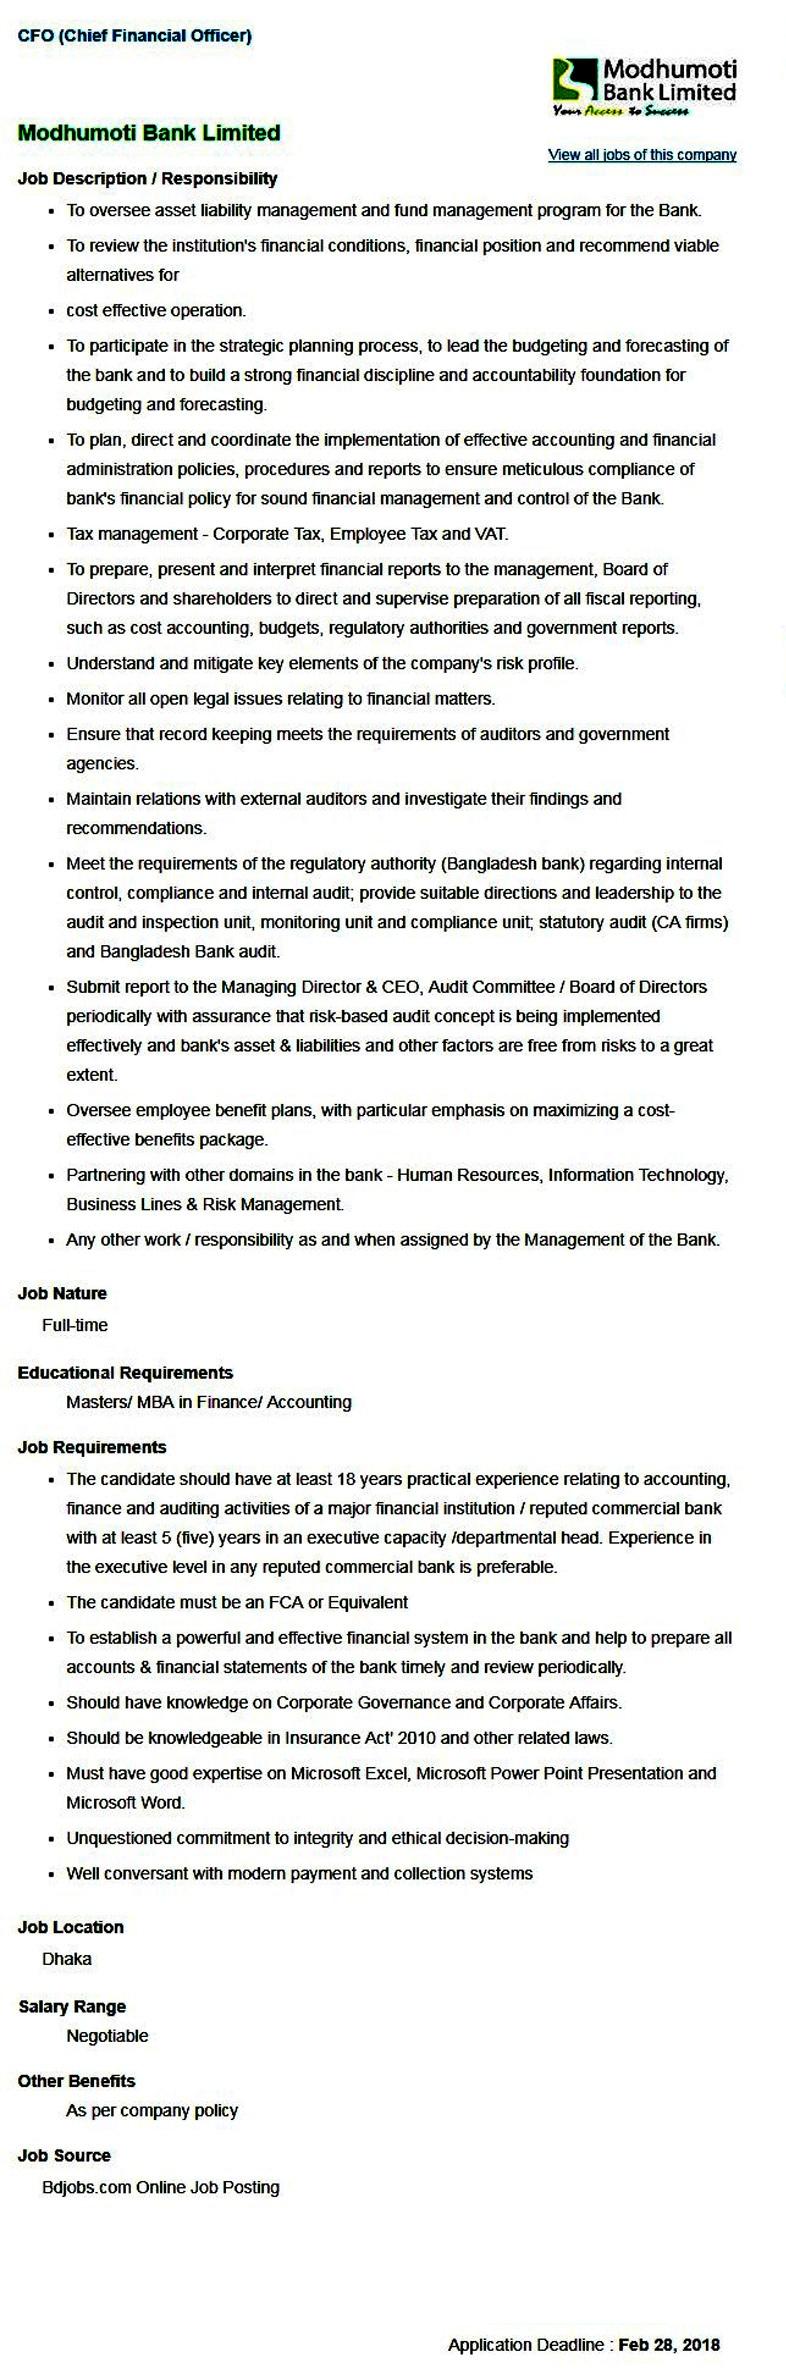 Modhumoti Bank Jobs Circular 2018